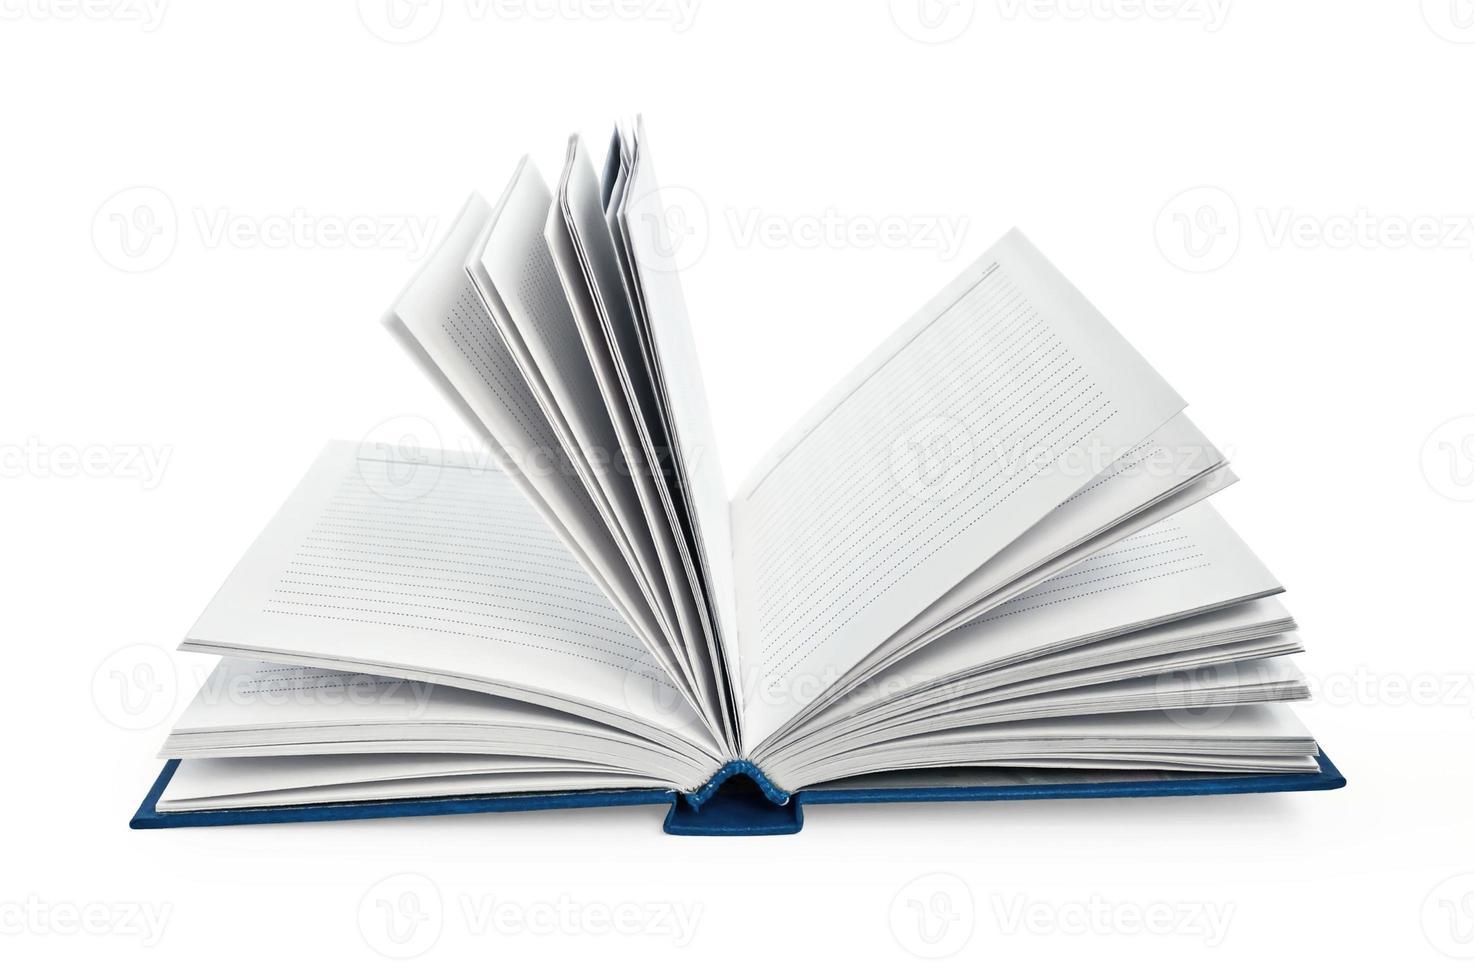 caderno divulgado foto